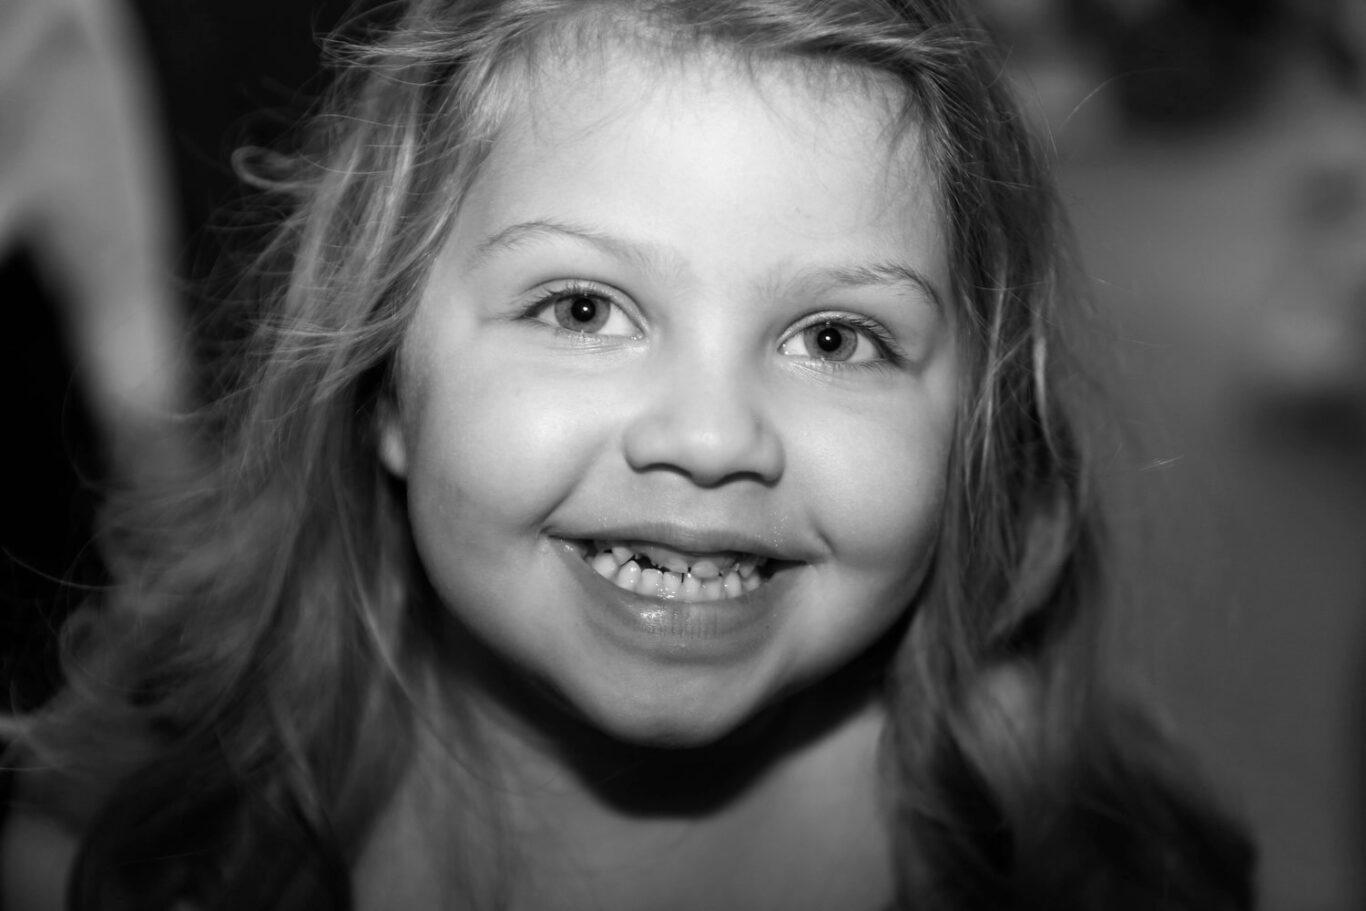 cute girl b&w photography